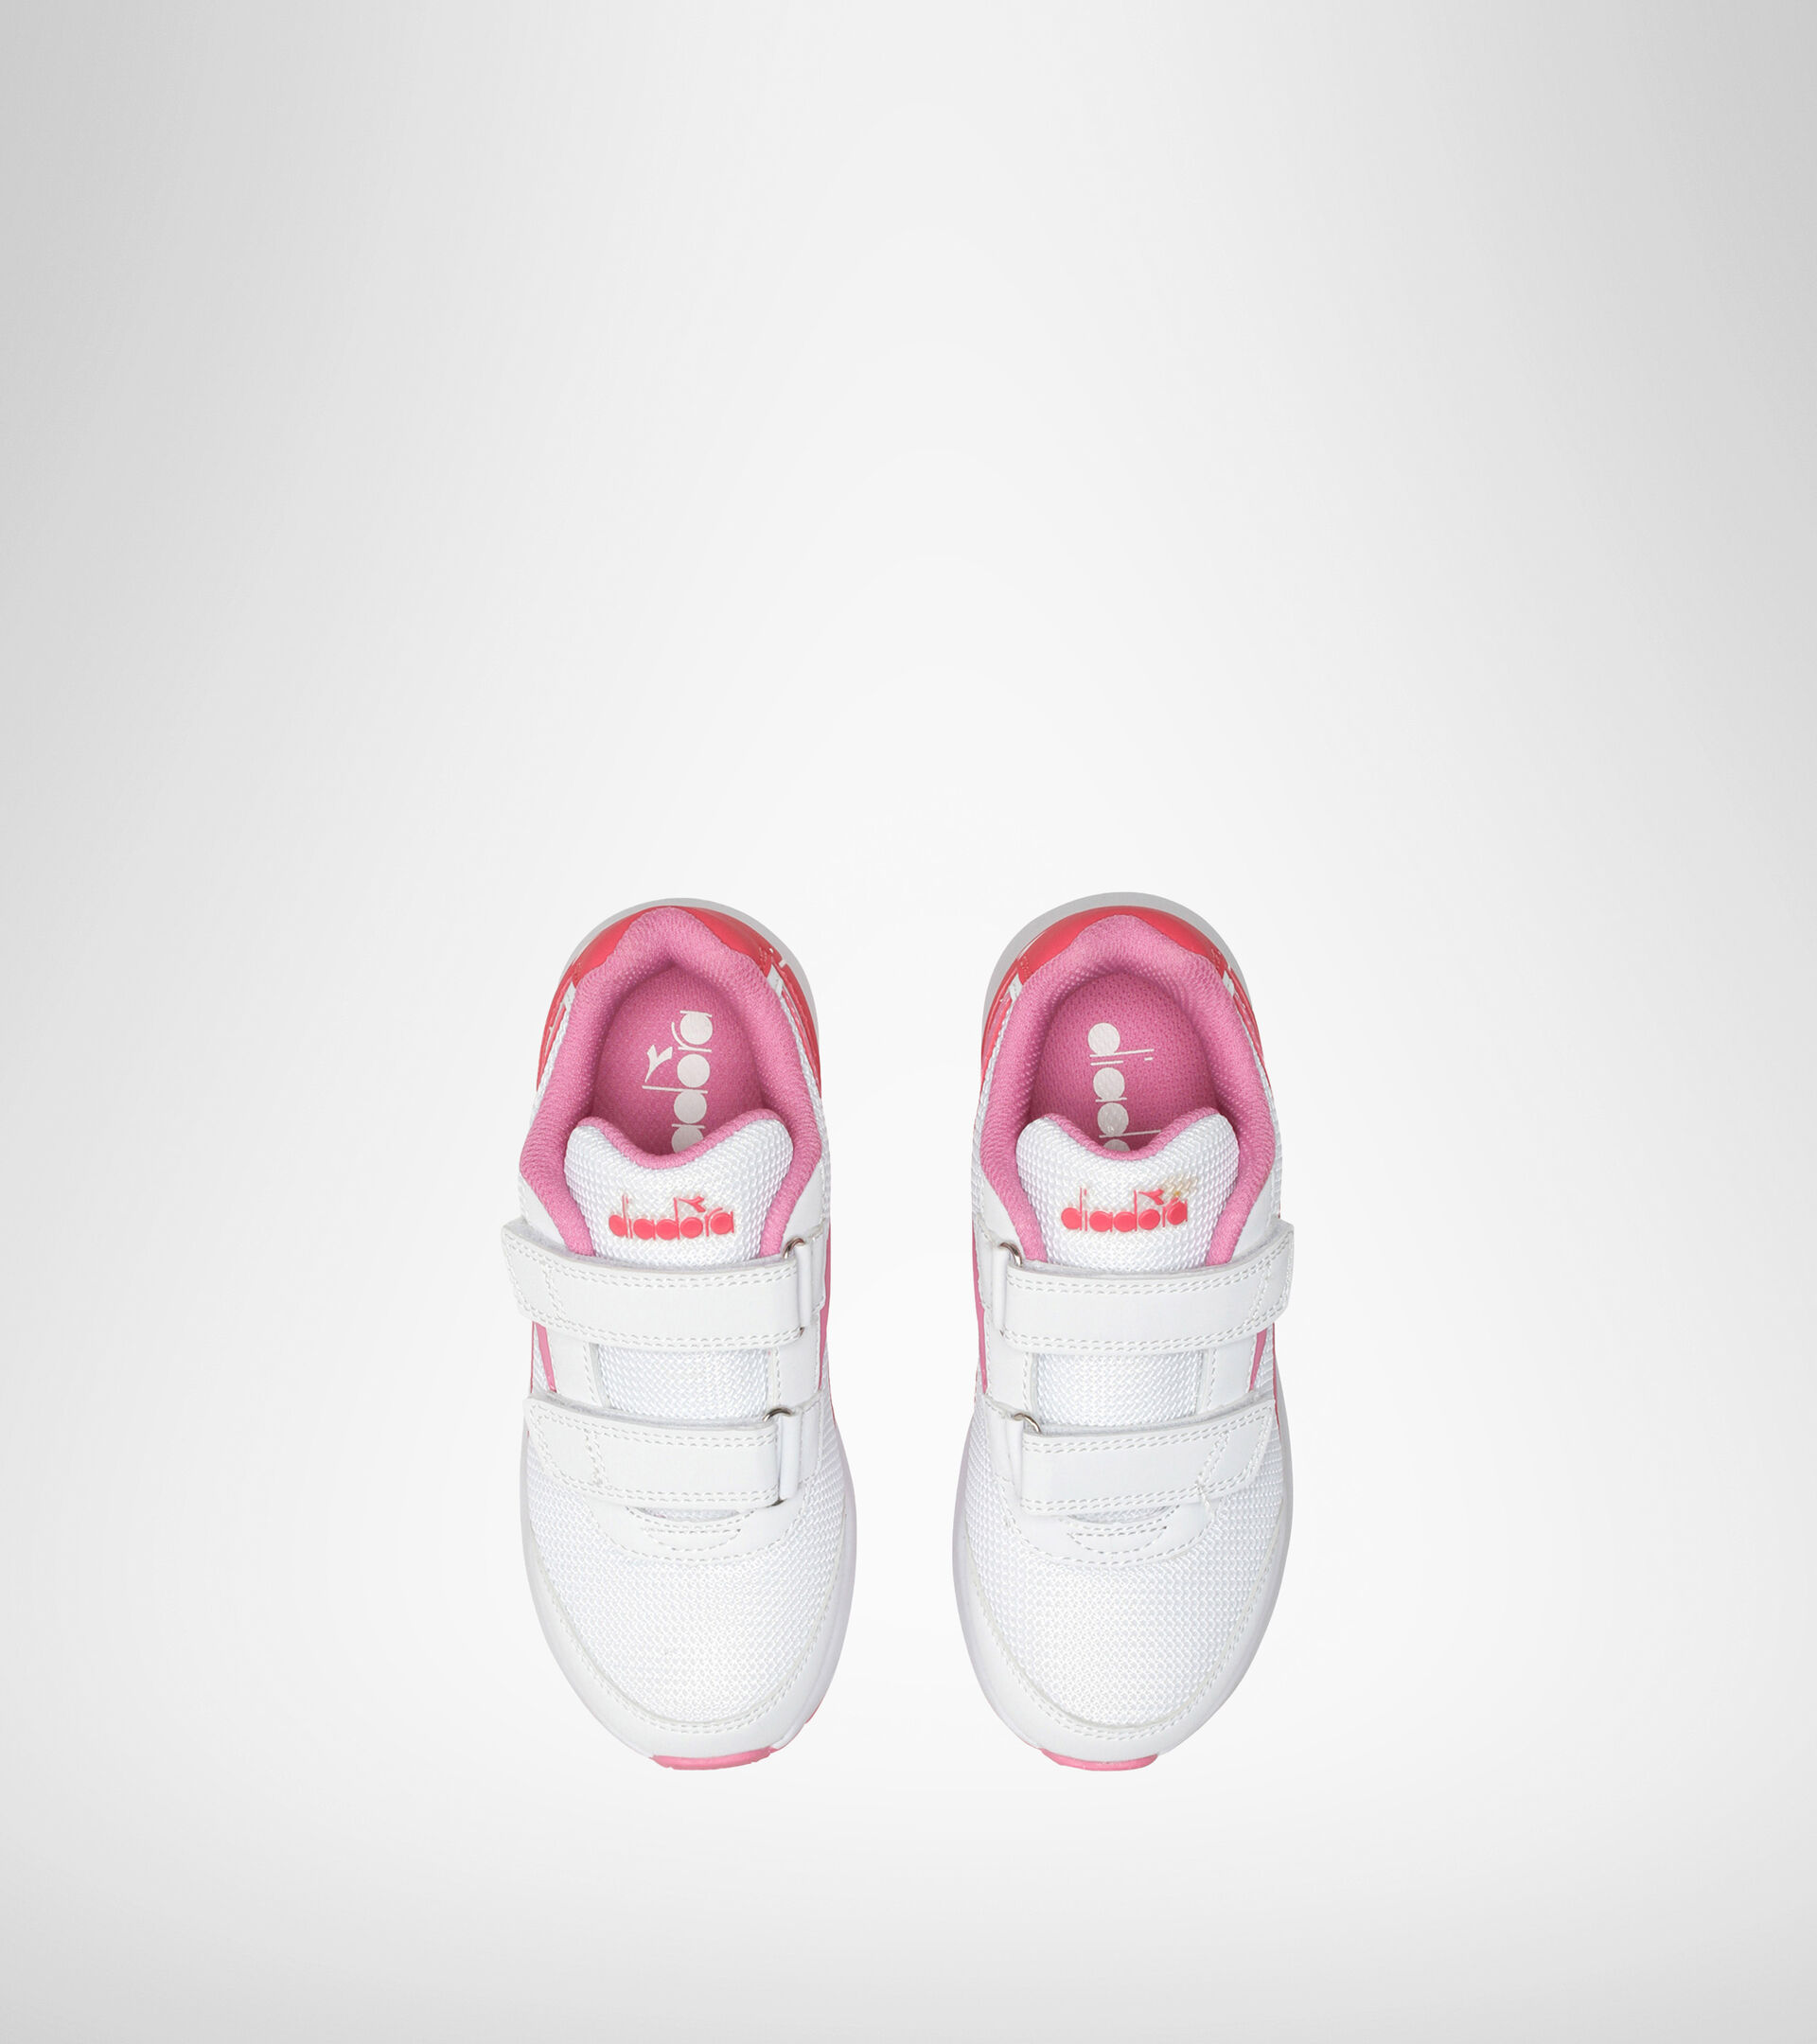 Chaussures de running - Unisexe Enfant FALCON JR V BIANCO/ROSA ORCHIDEA - Diadora